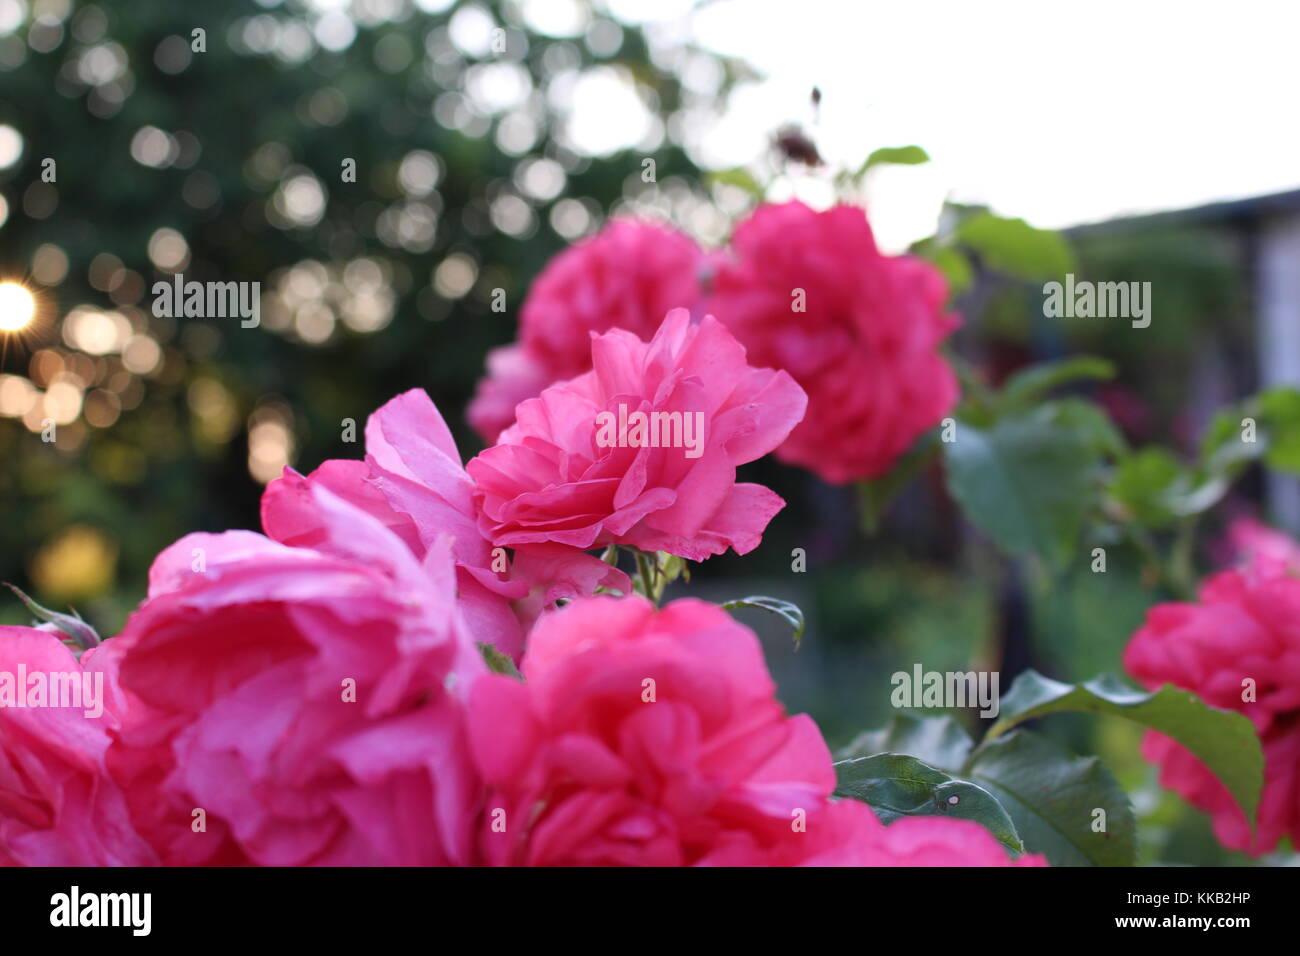 Pink Flowers Tumblr Imagenes De Stock Pink Flowers Tumblr Fotos De